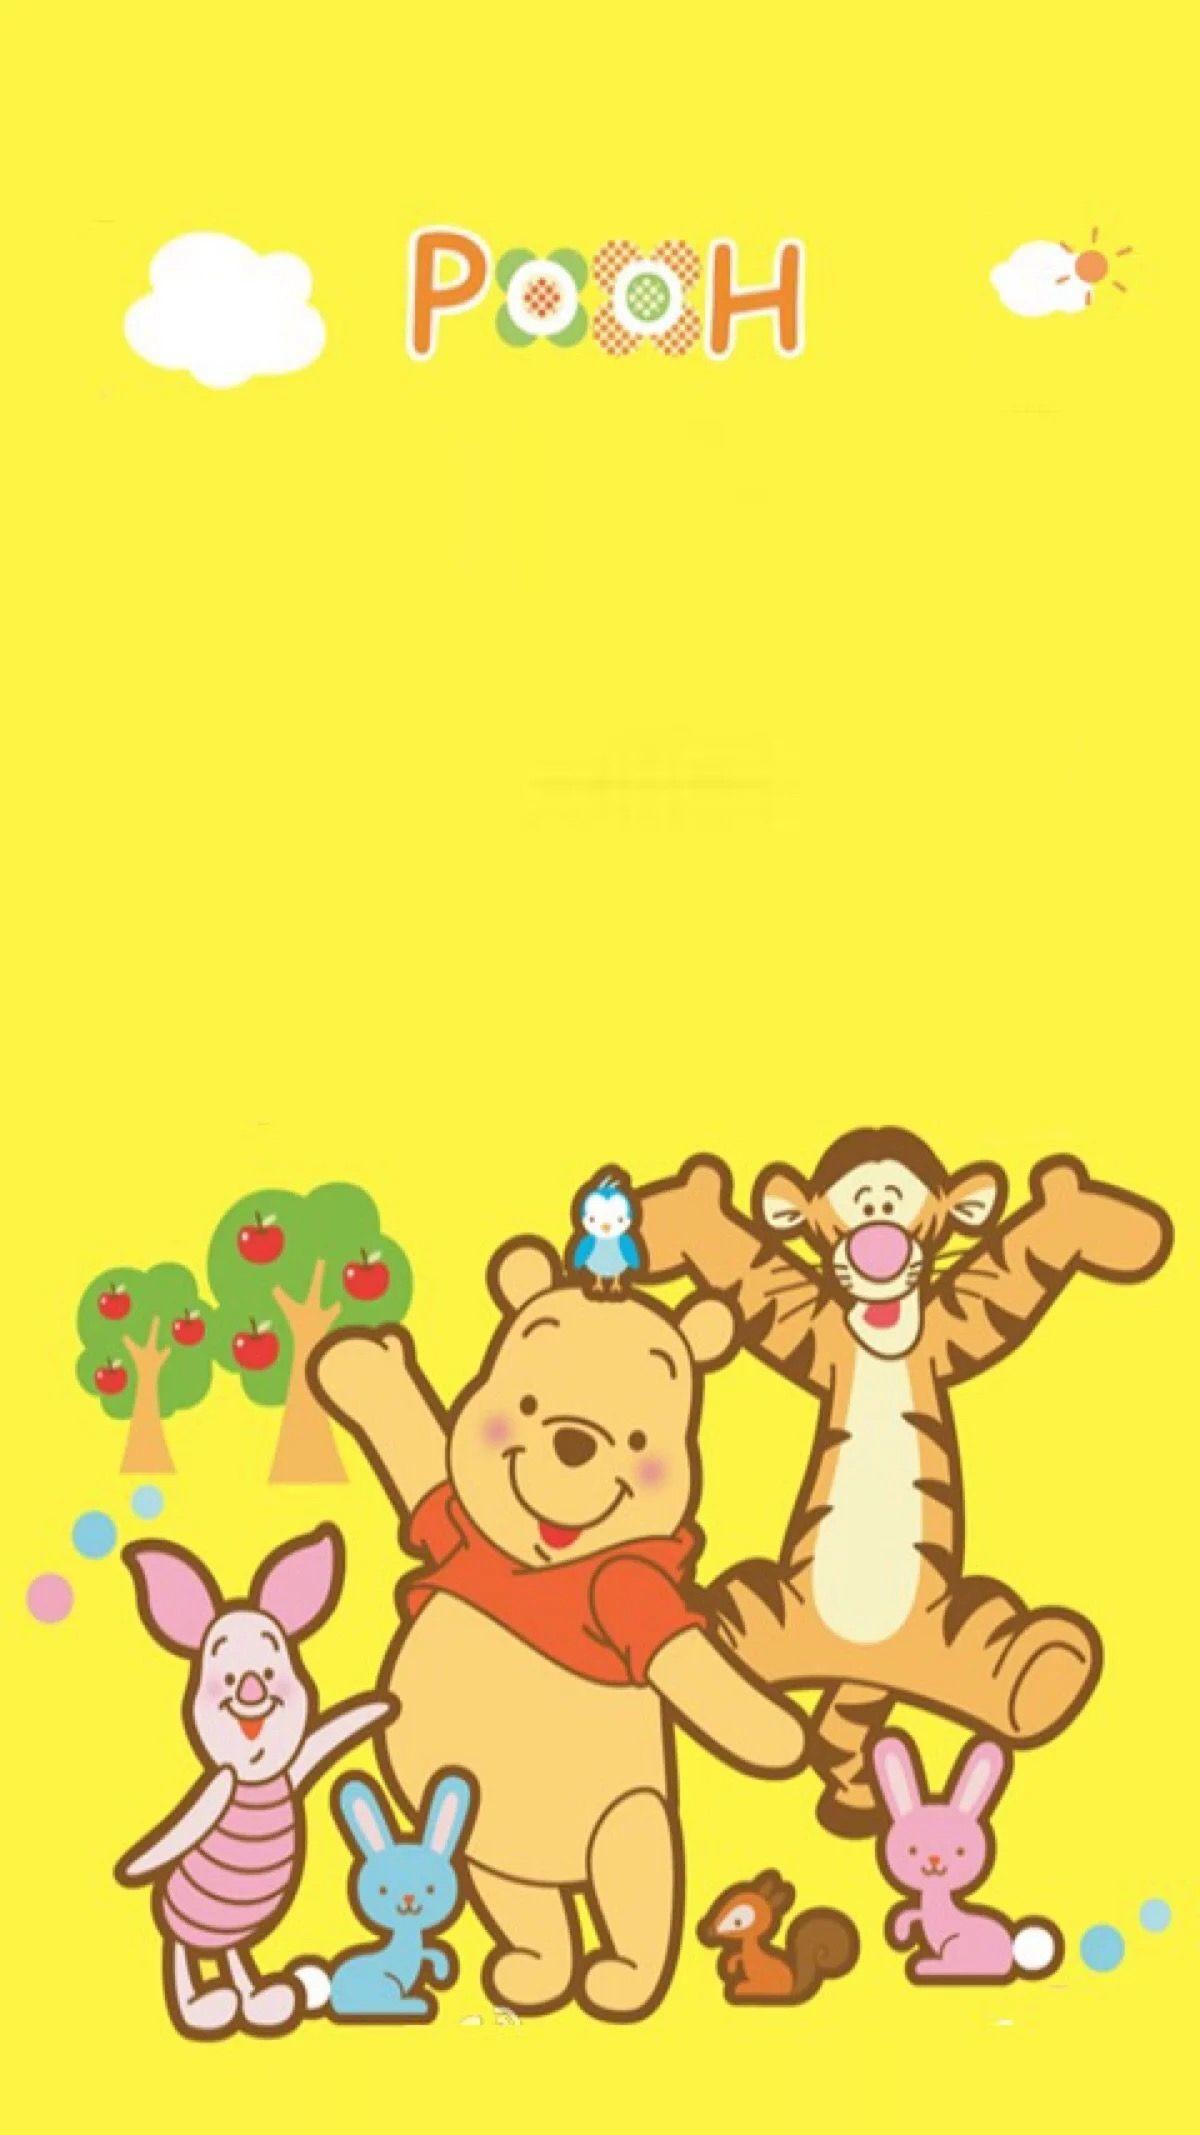 Pooh Bear Wallpaper 74 Images